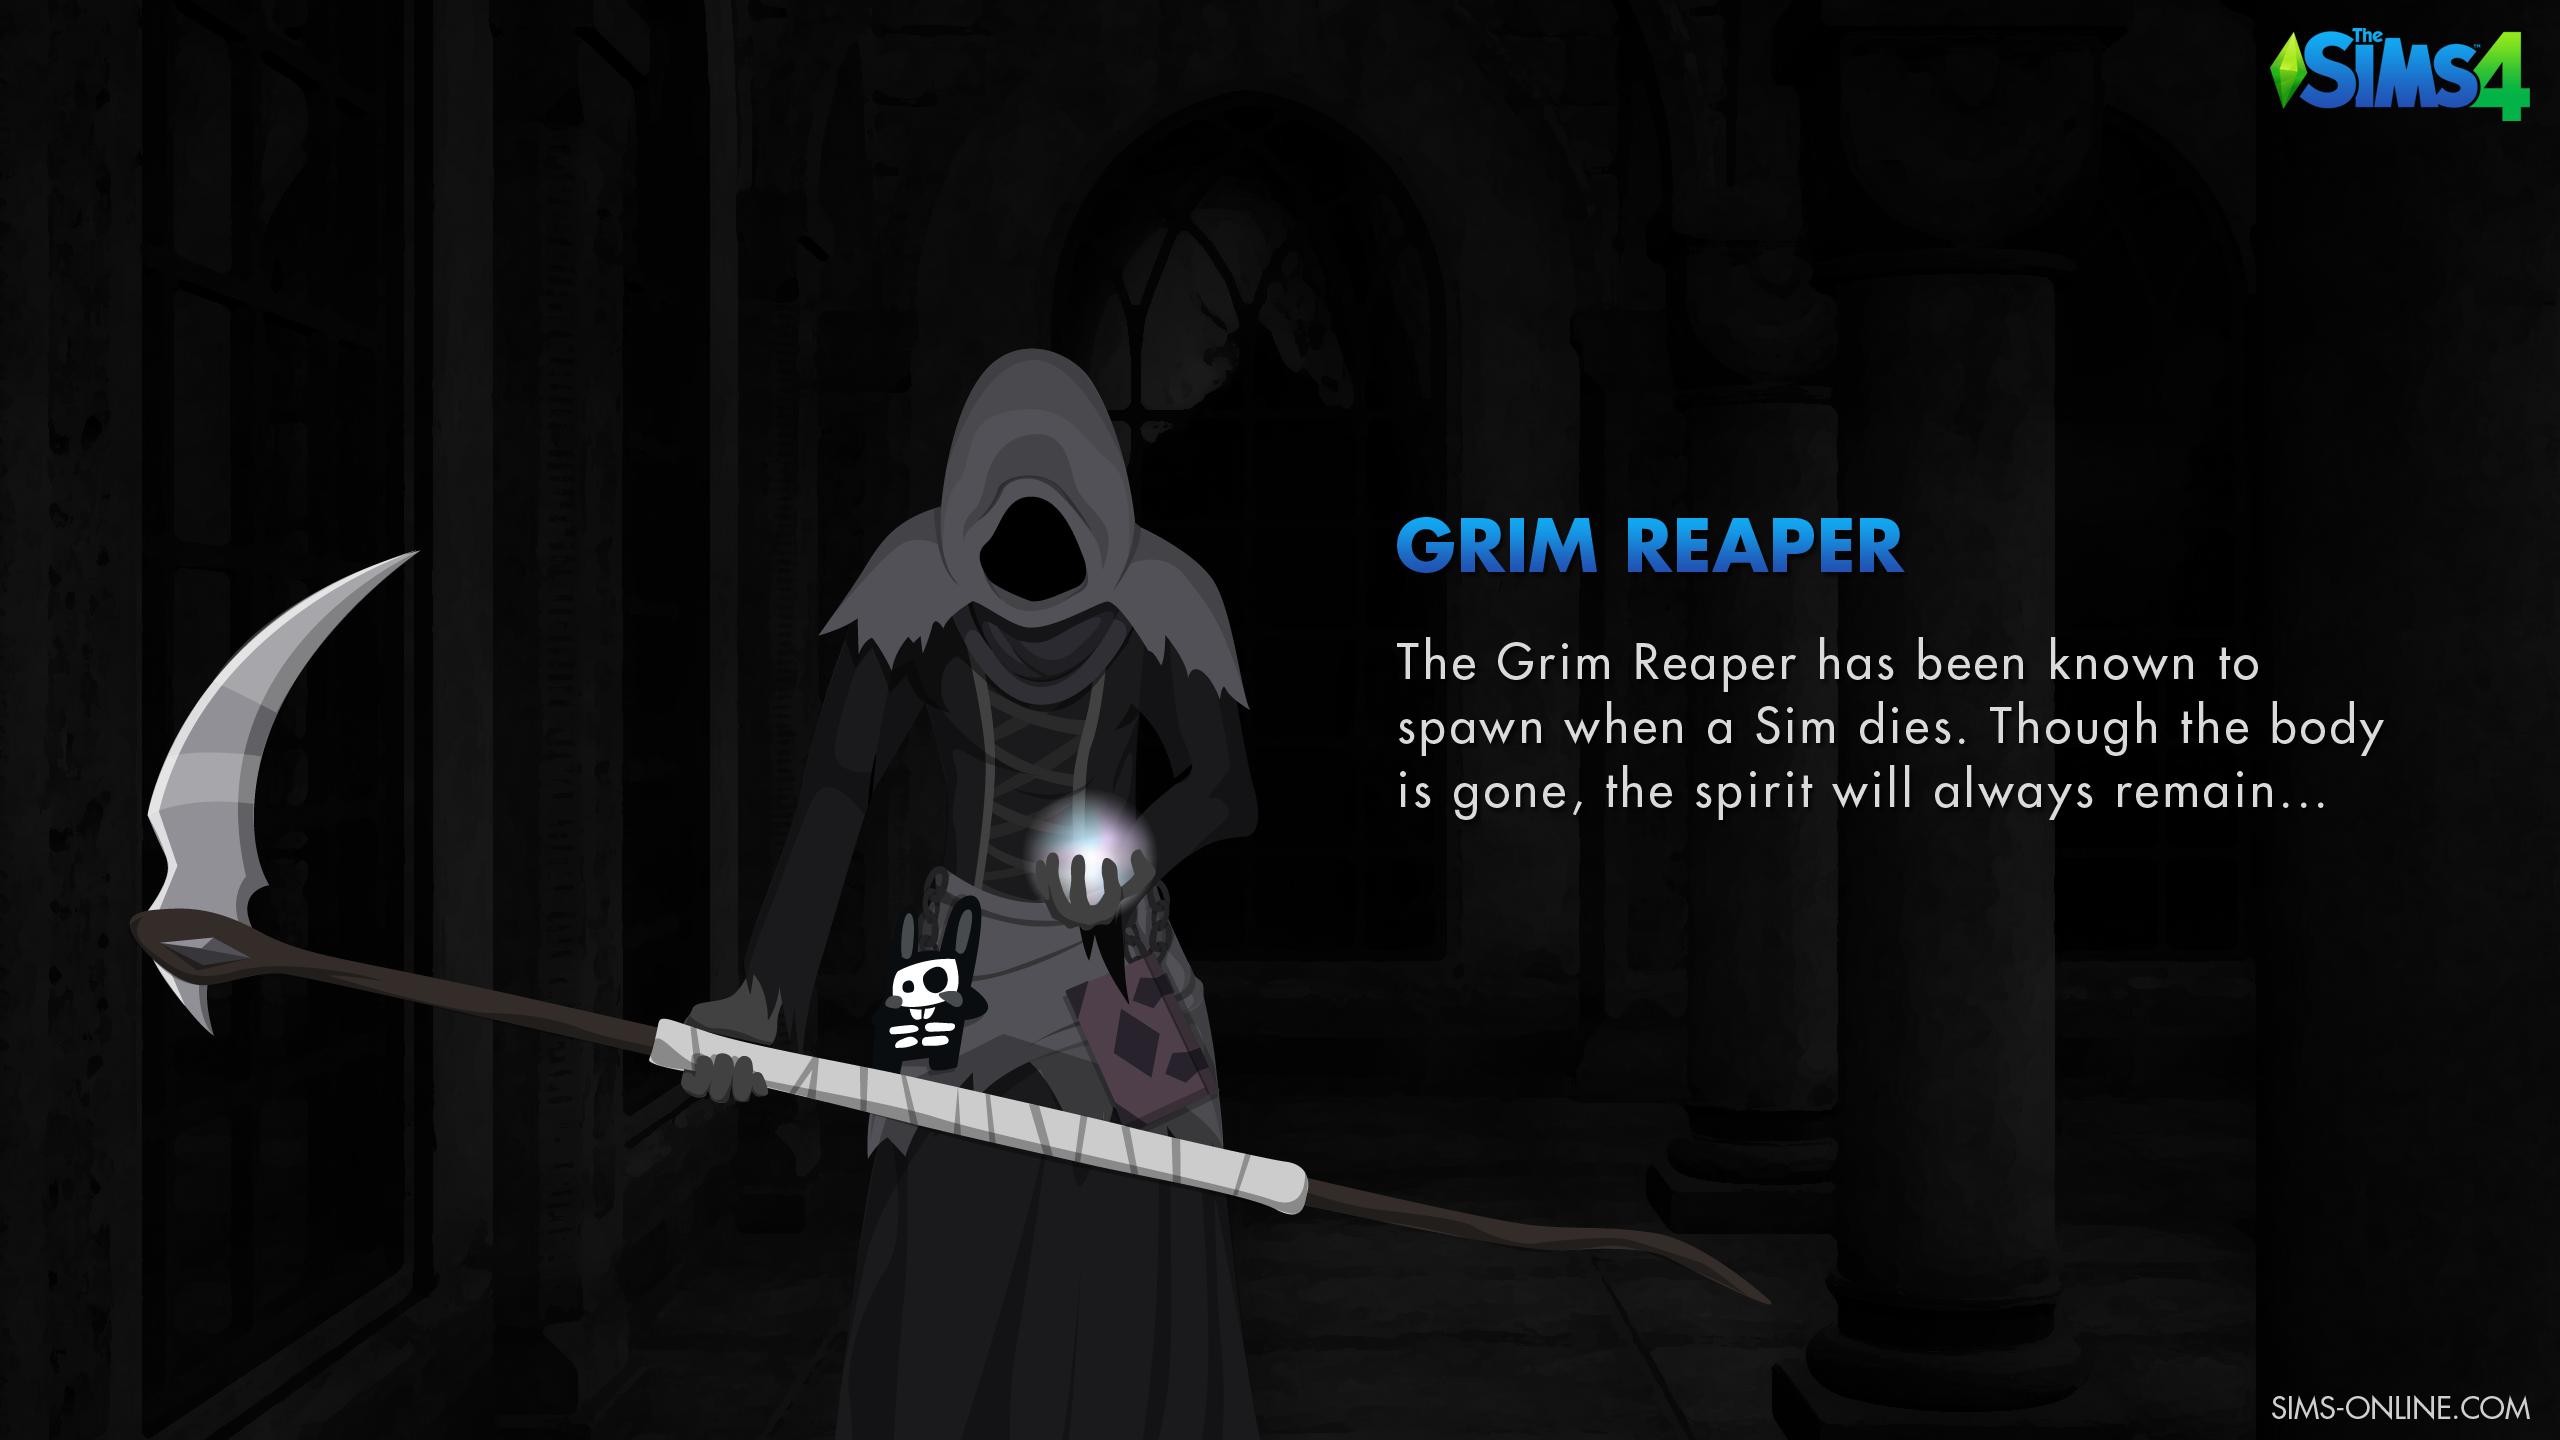 The Sims 4 Grim Reaper Wallpaper   Sims Online 2560x1440